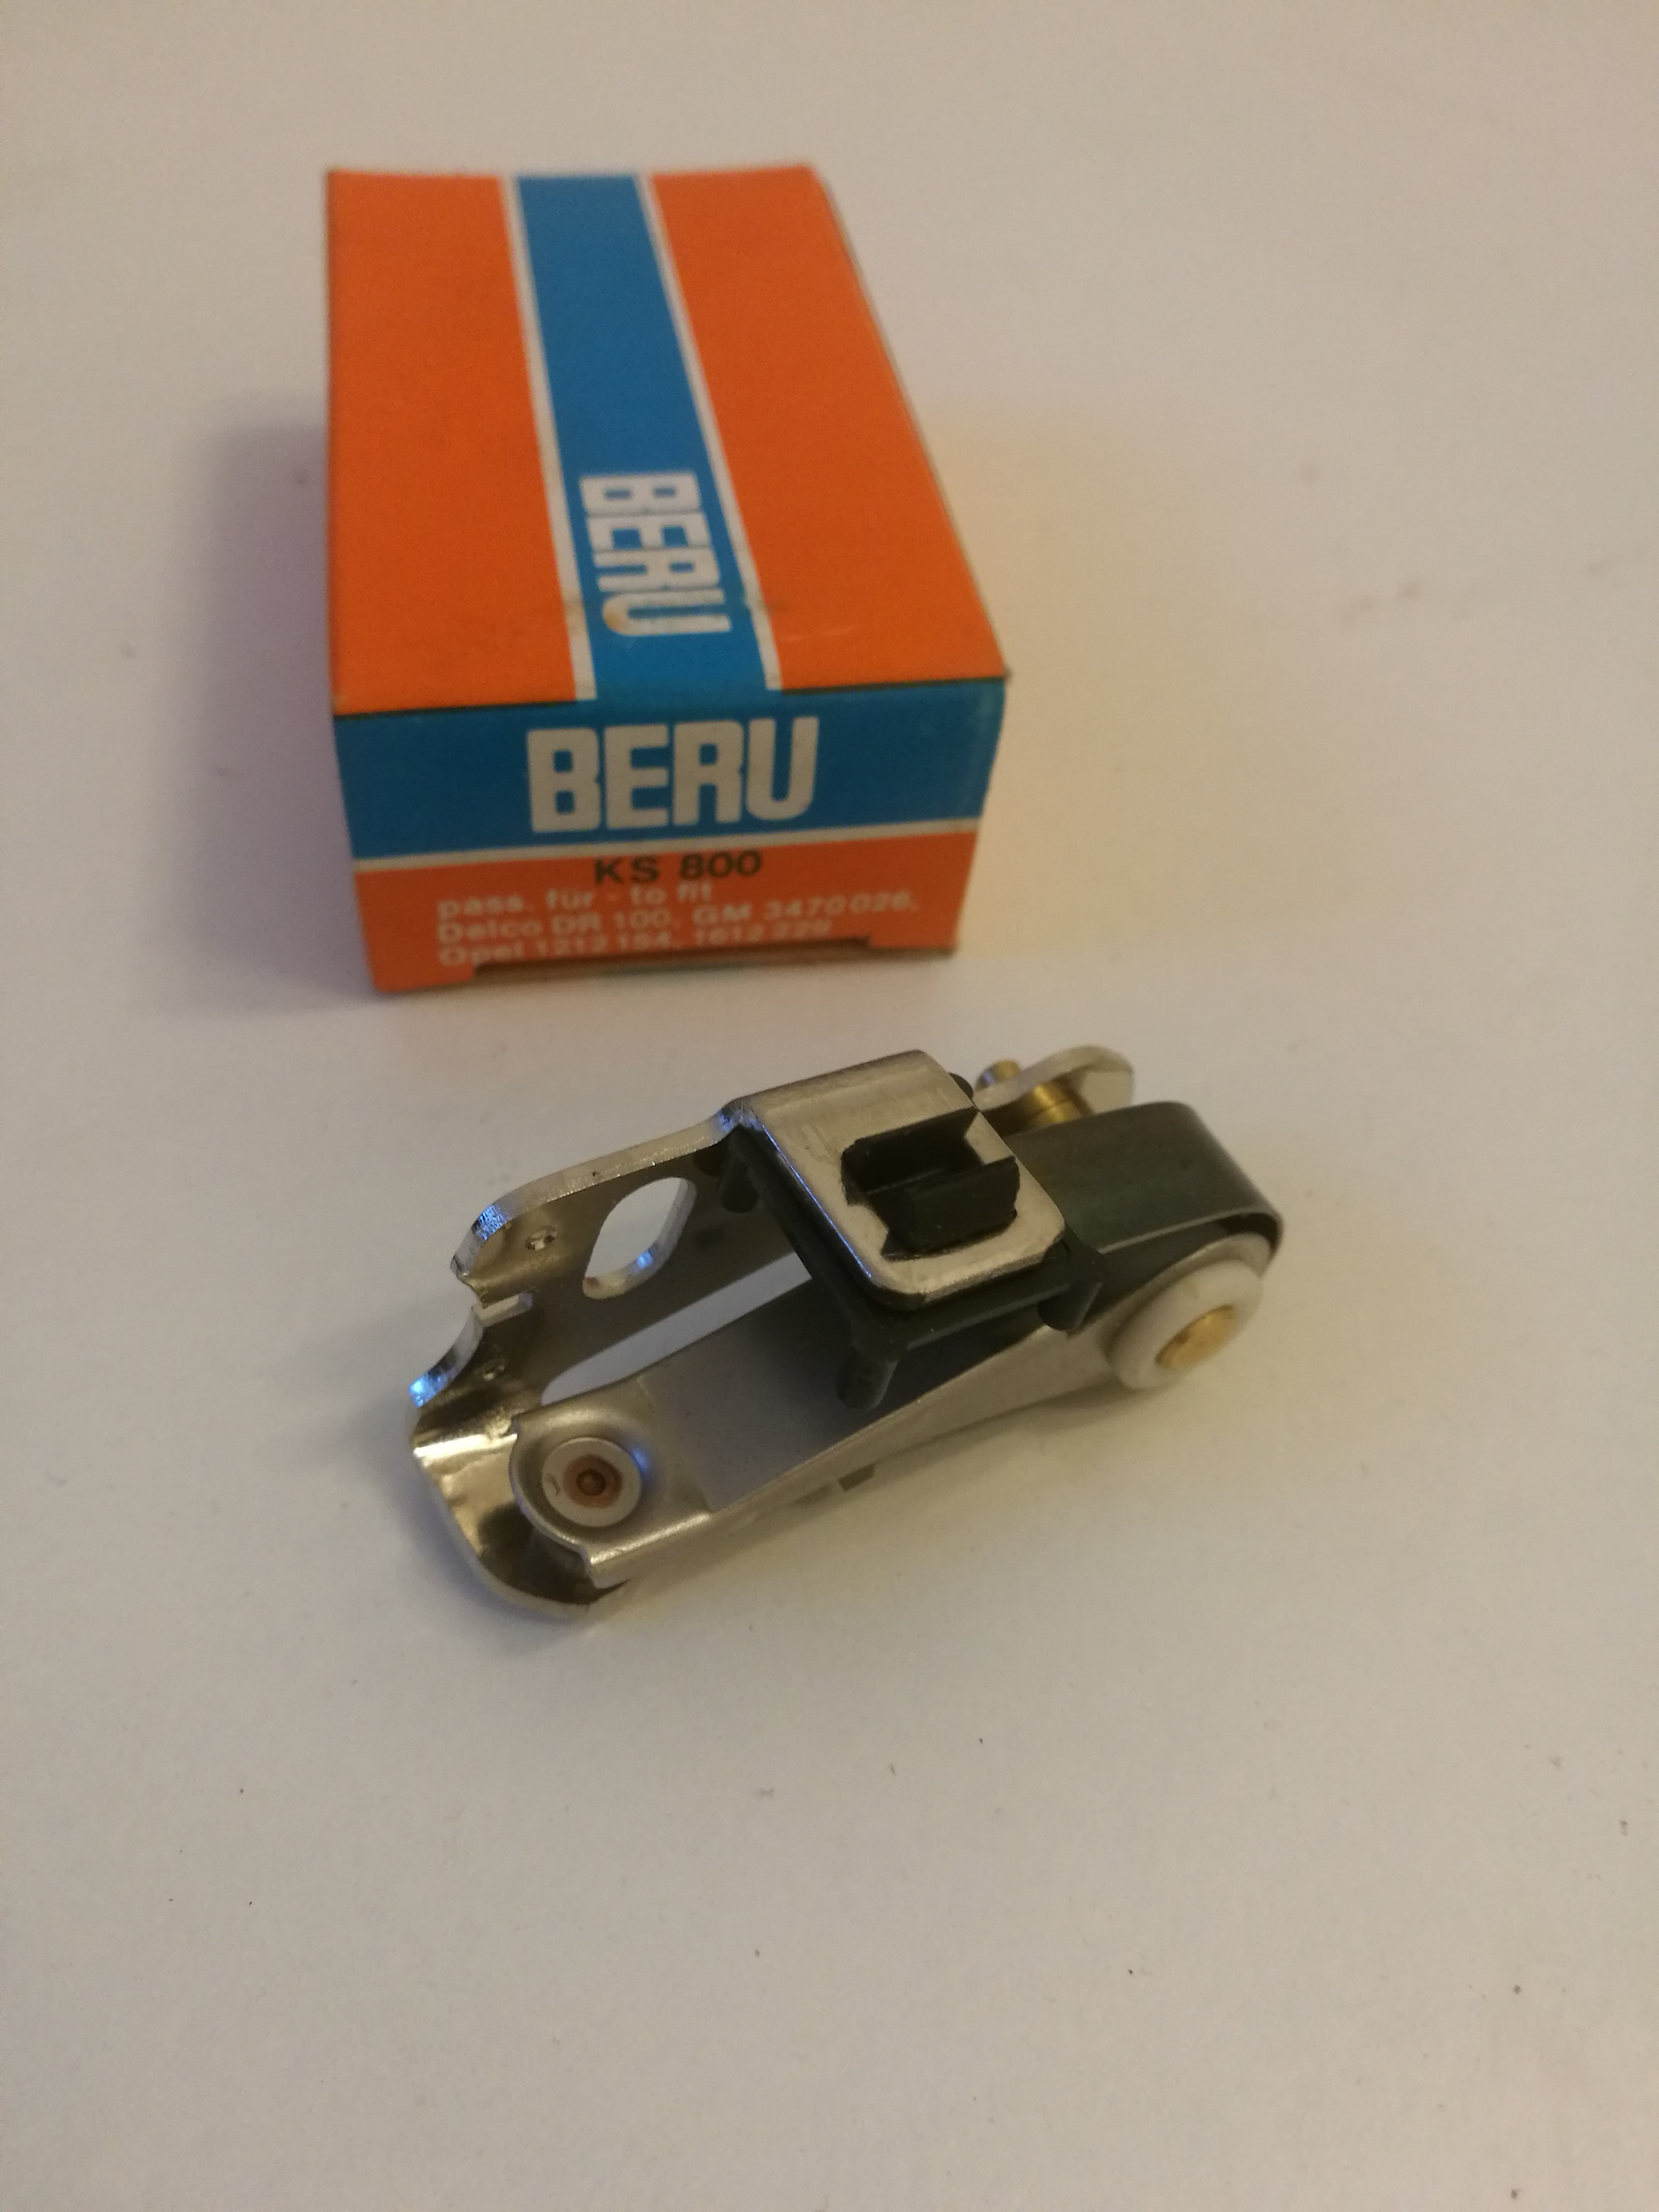 Beru KS800 Zündkontaktsatz Delco Opel Kontaktsatz contact set Jeux de Linguet